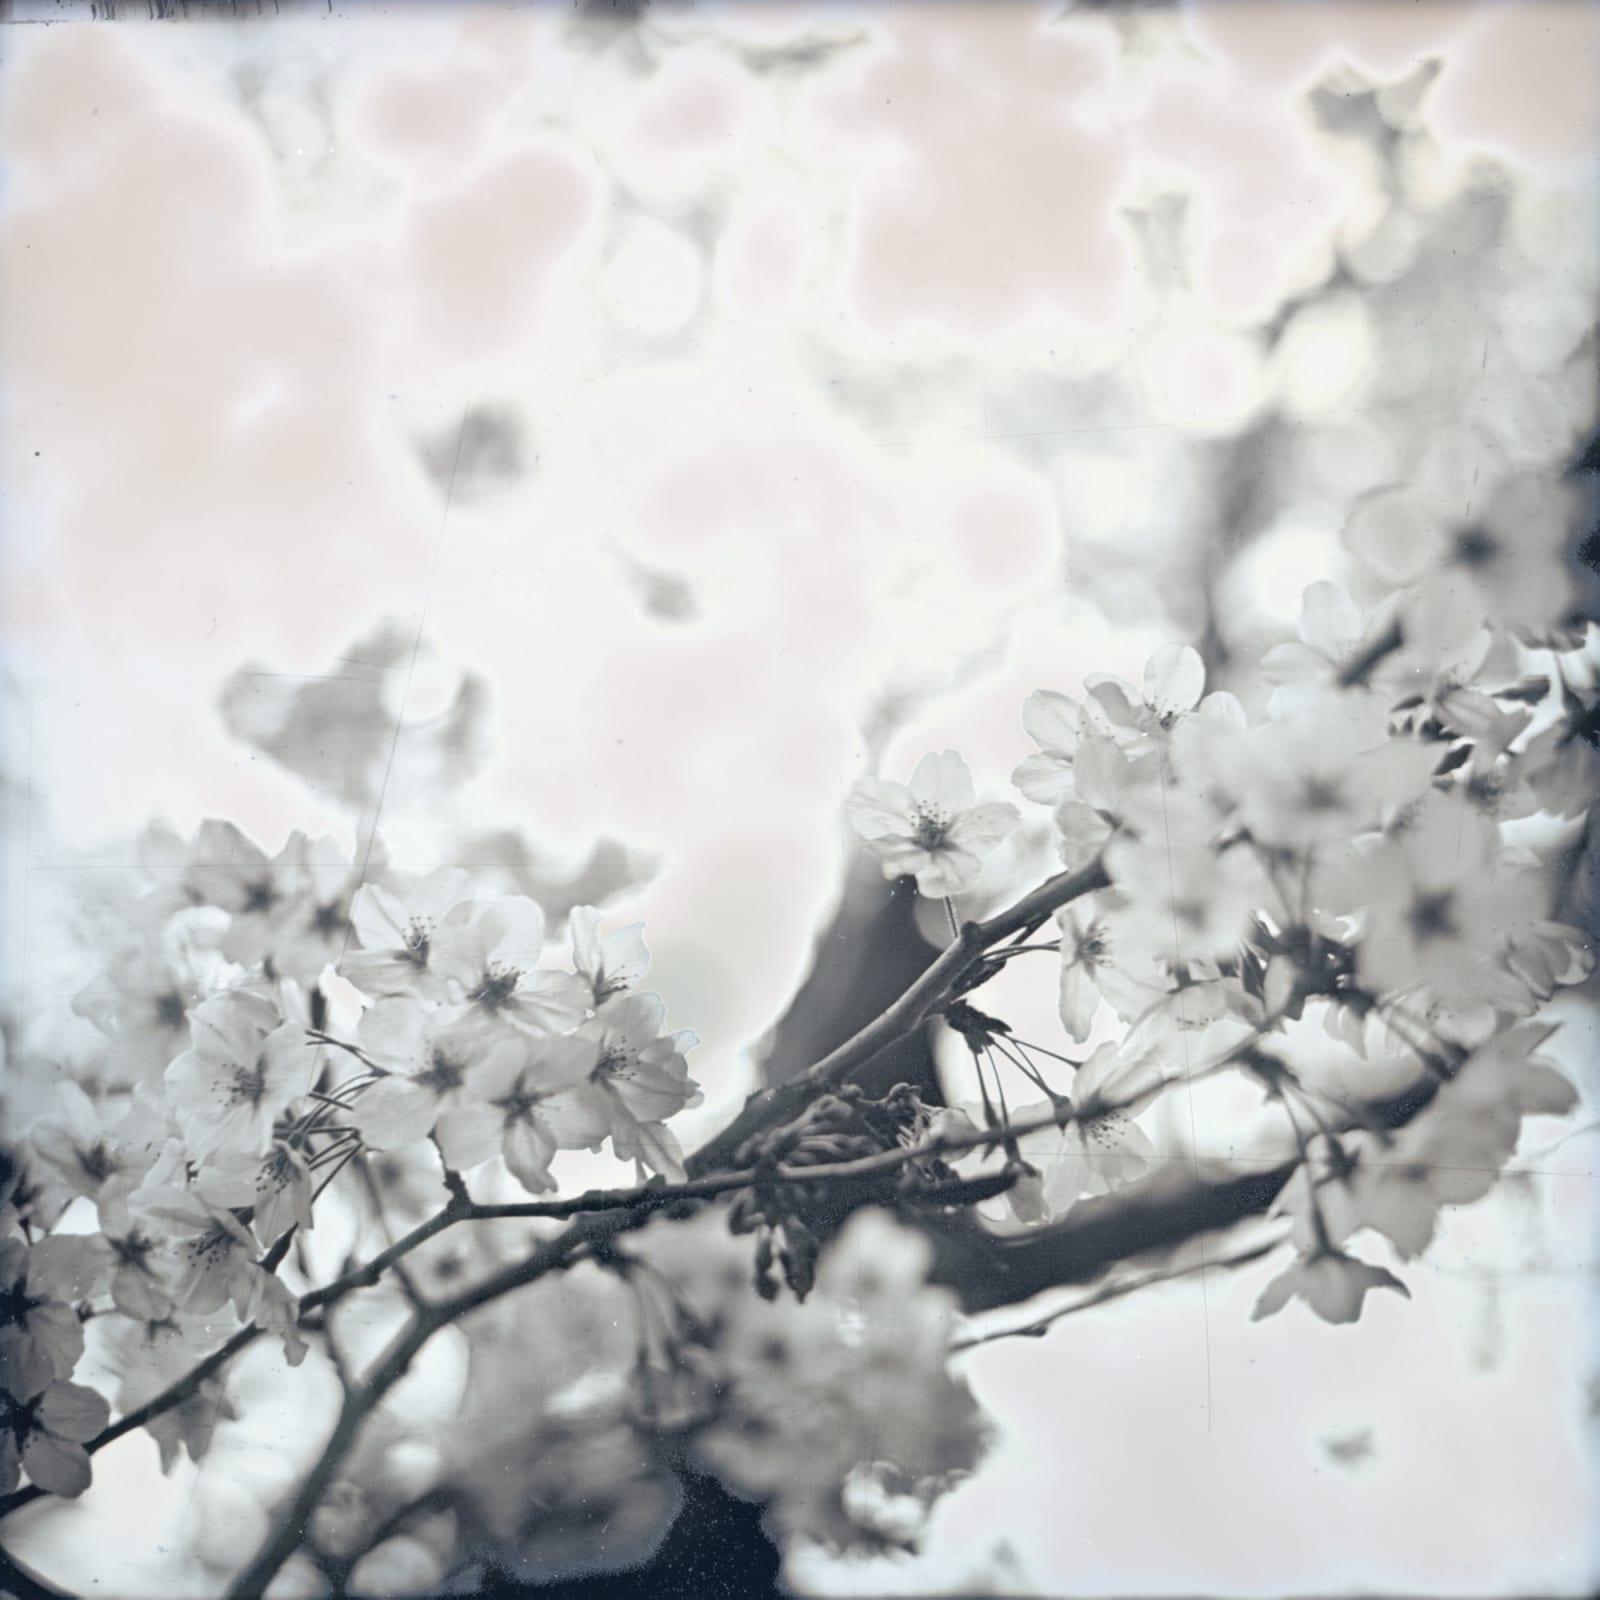 Takashi Arai, Sakura Bandobashi, March 28, 2019